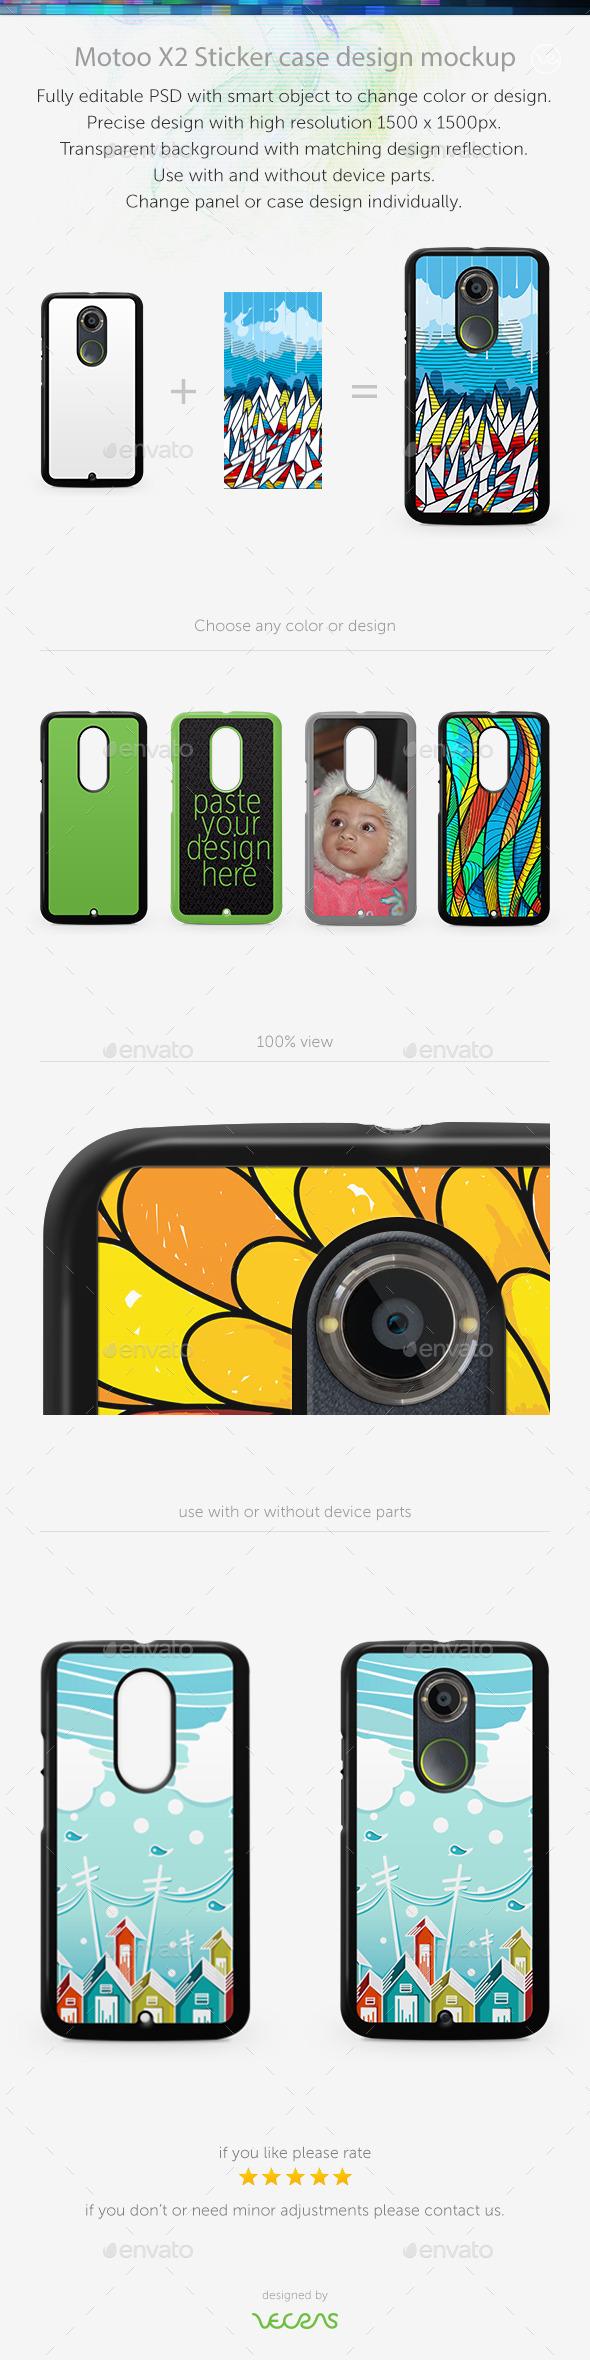 GraphicRiver Motoo X2 Sticker Case Design Mockup 10564723